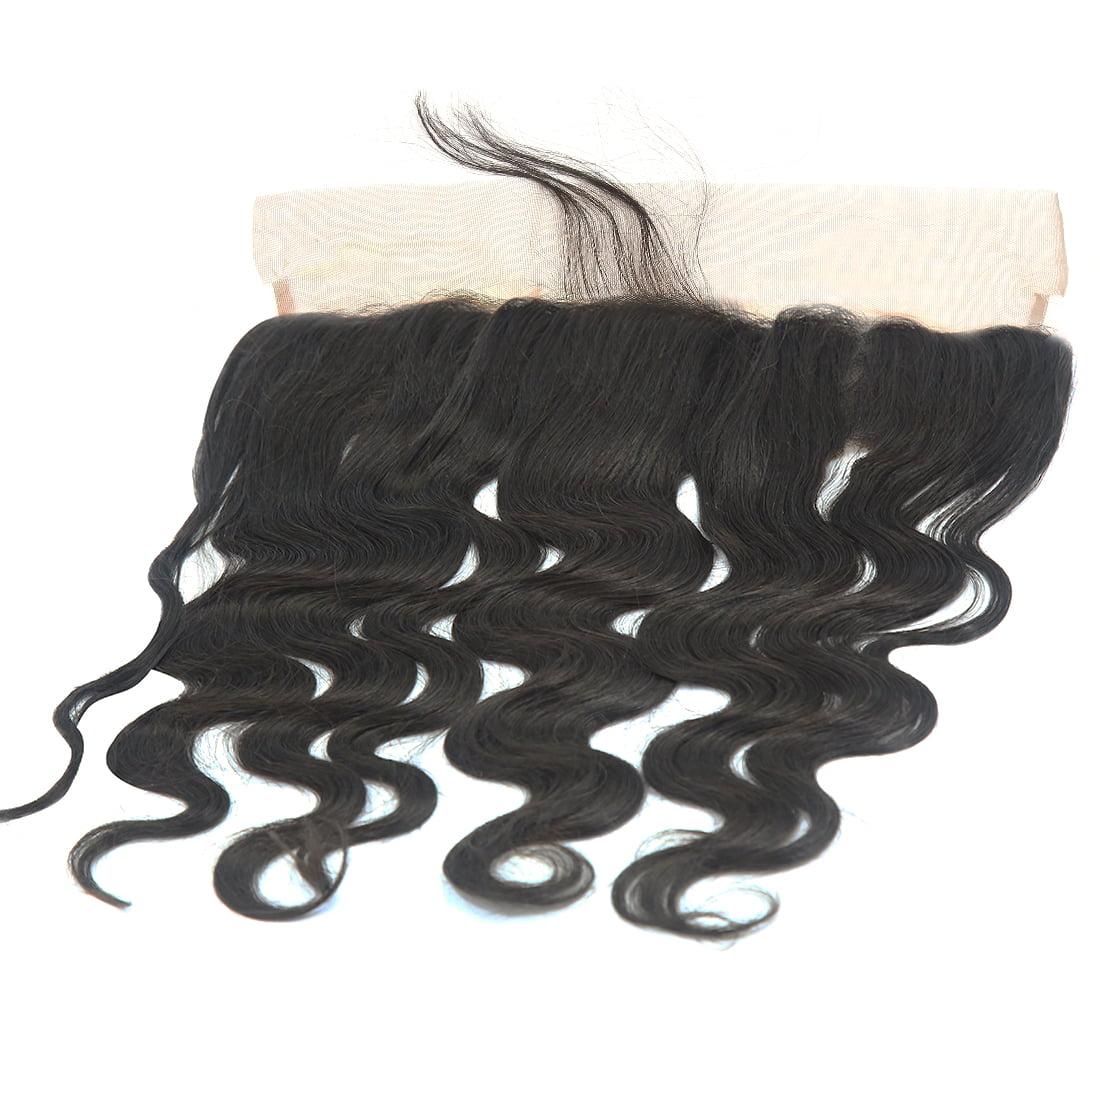 "12"" 13x4 Ear To Ear Lace Closure Free Part Brazilian Hair Extensions Body Wave - image 4 de 7"